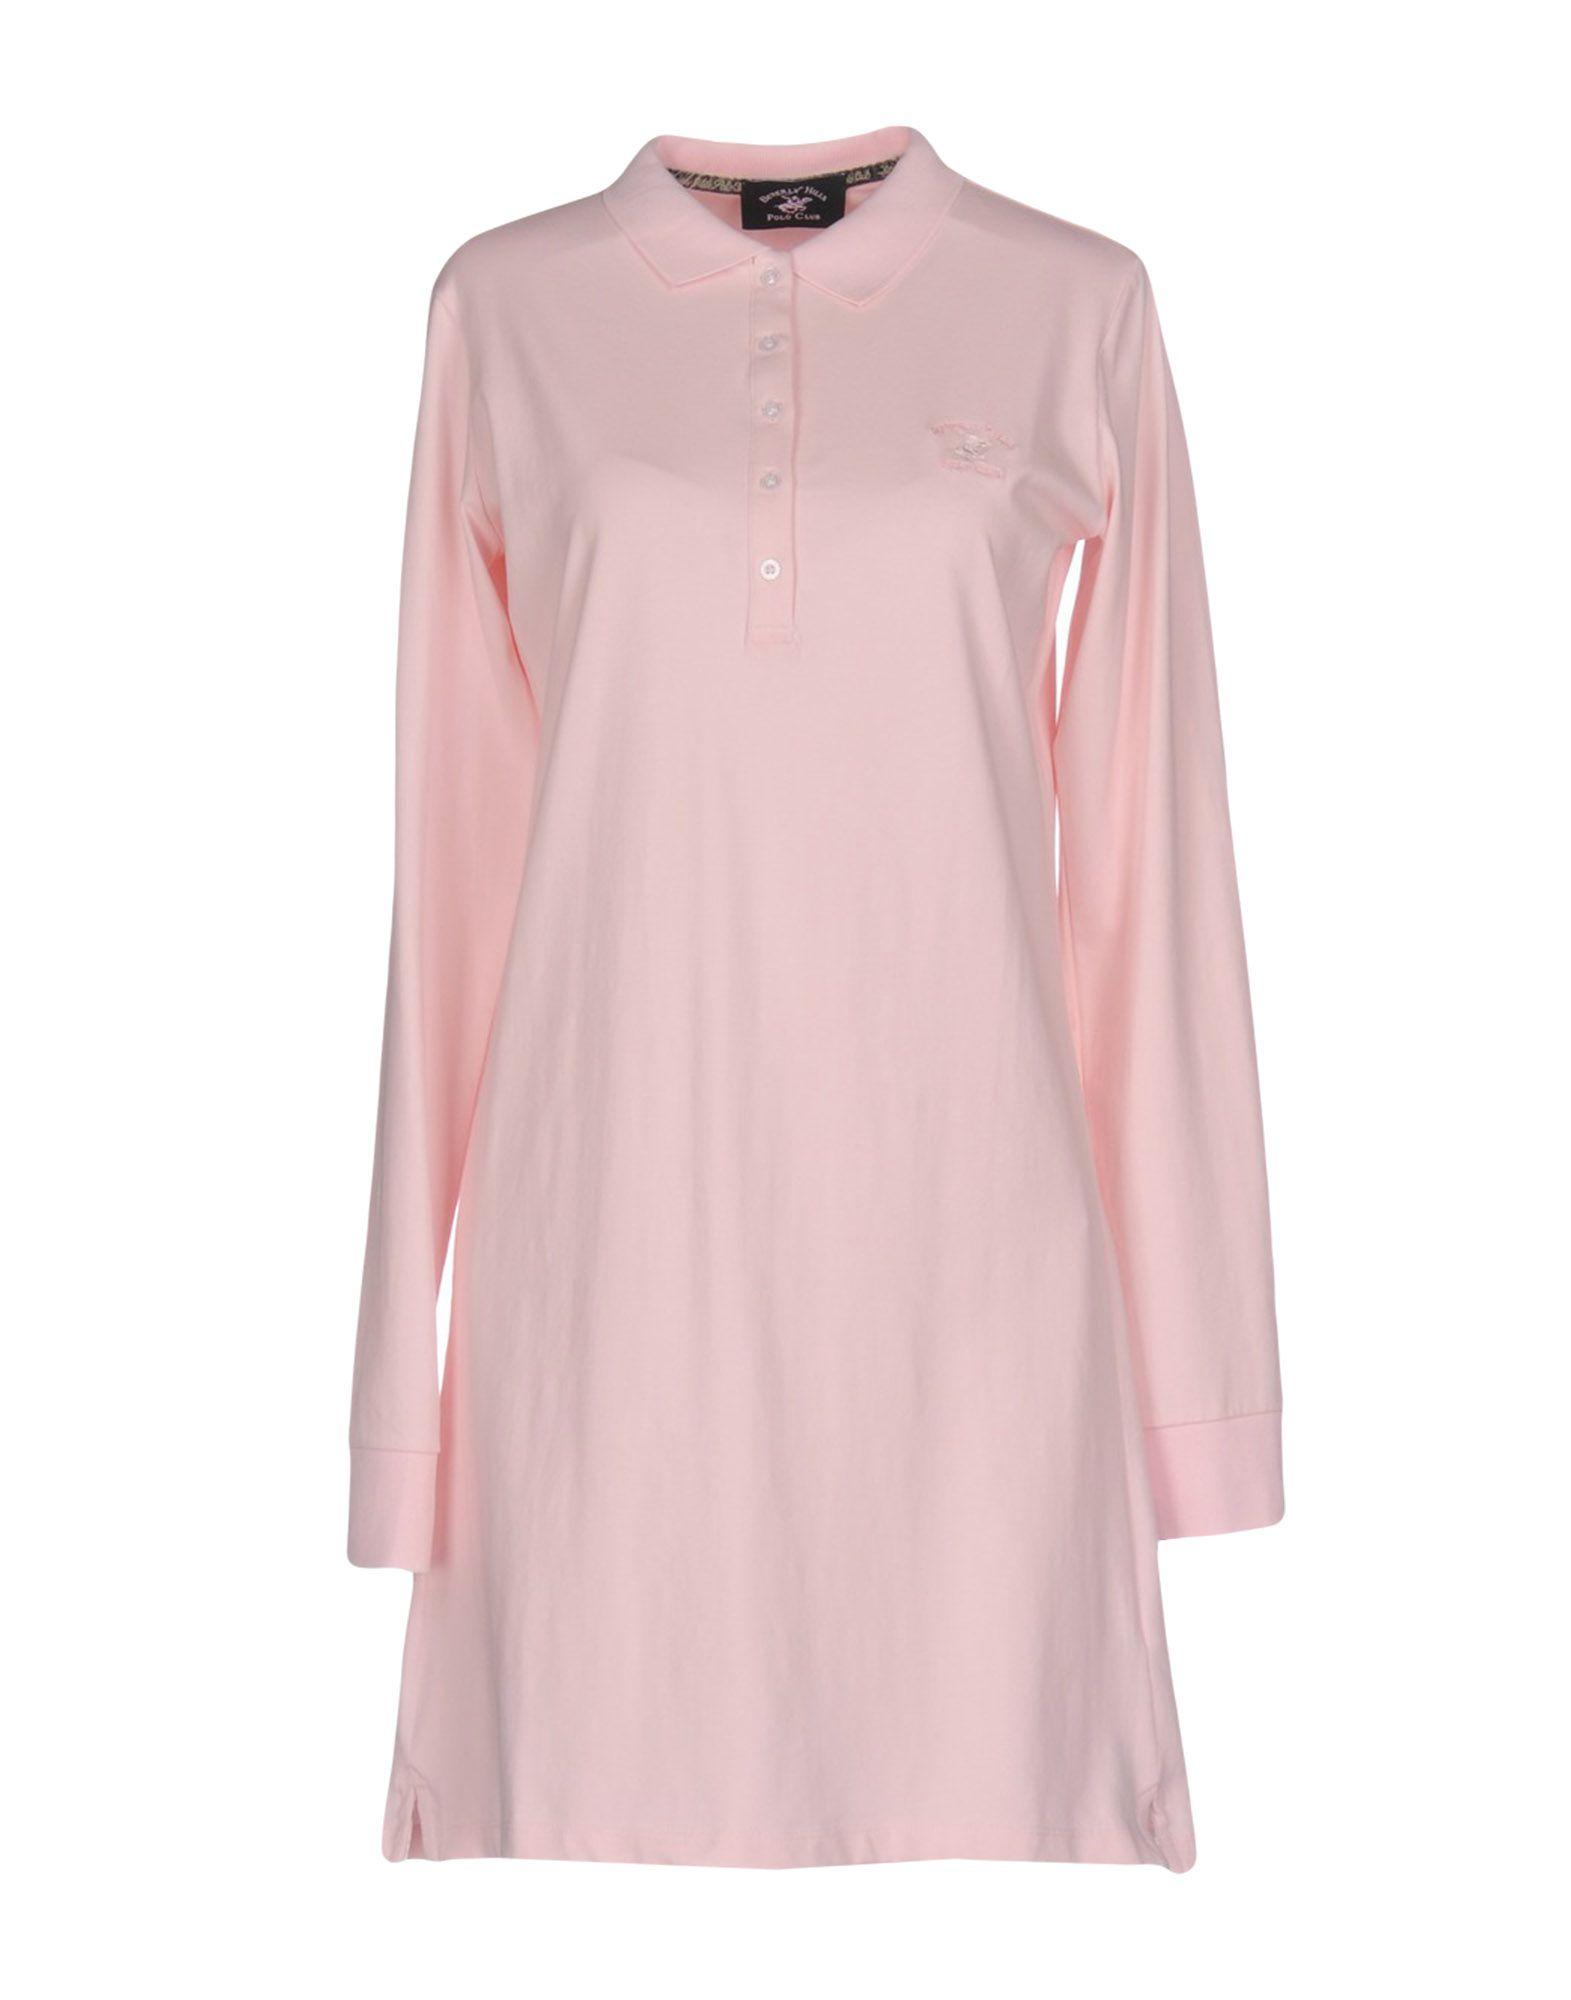 BEVERLY HILLS POLO CLUB Damen Kurzes Kleid Farbe Rosa Größe 6